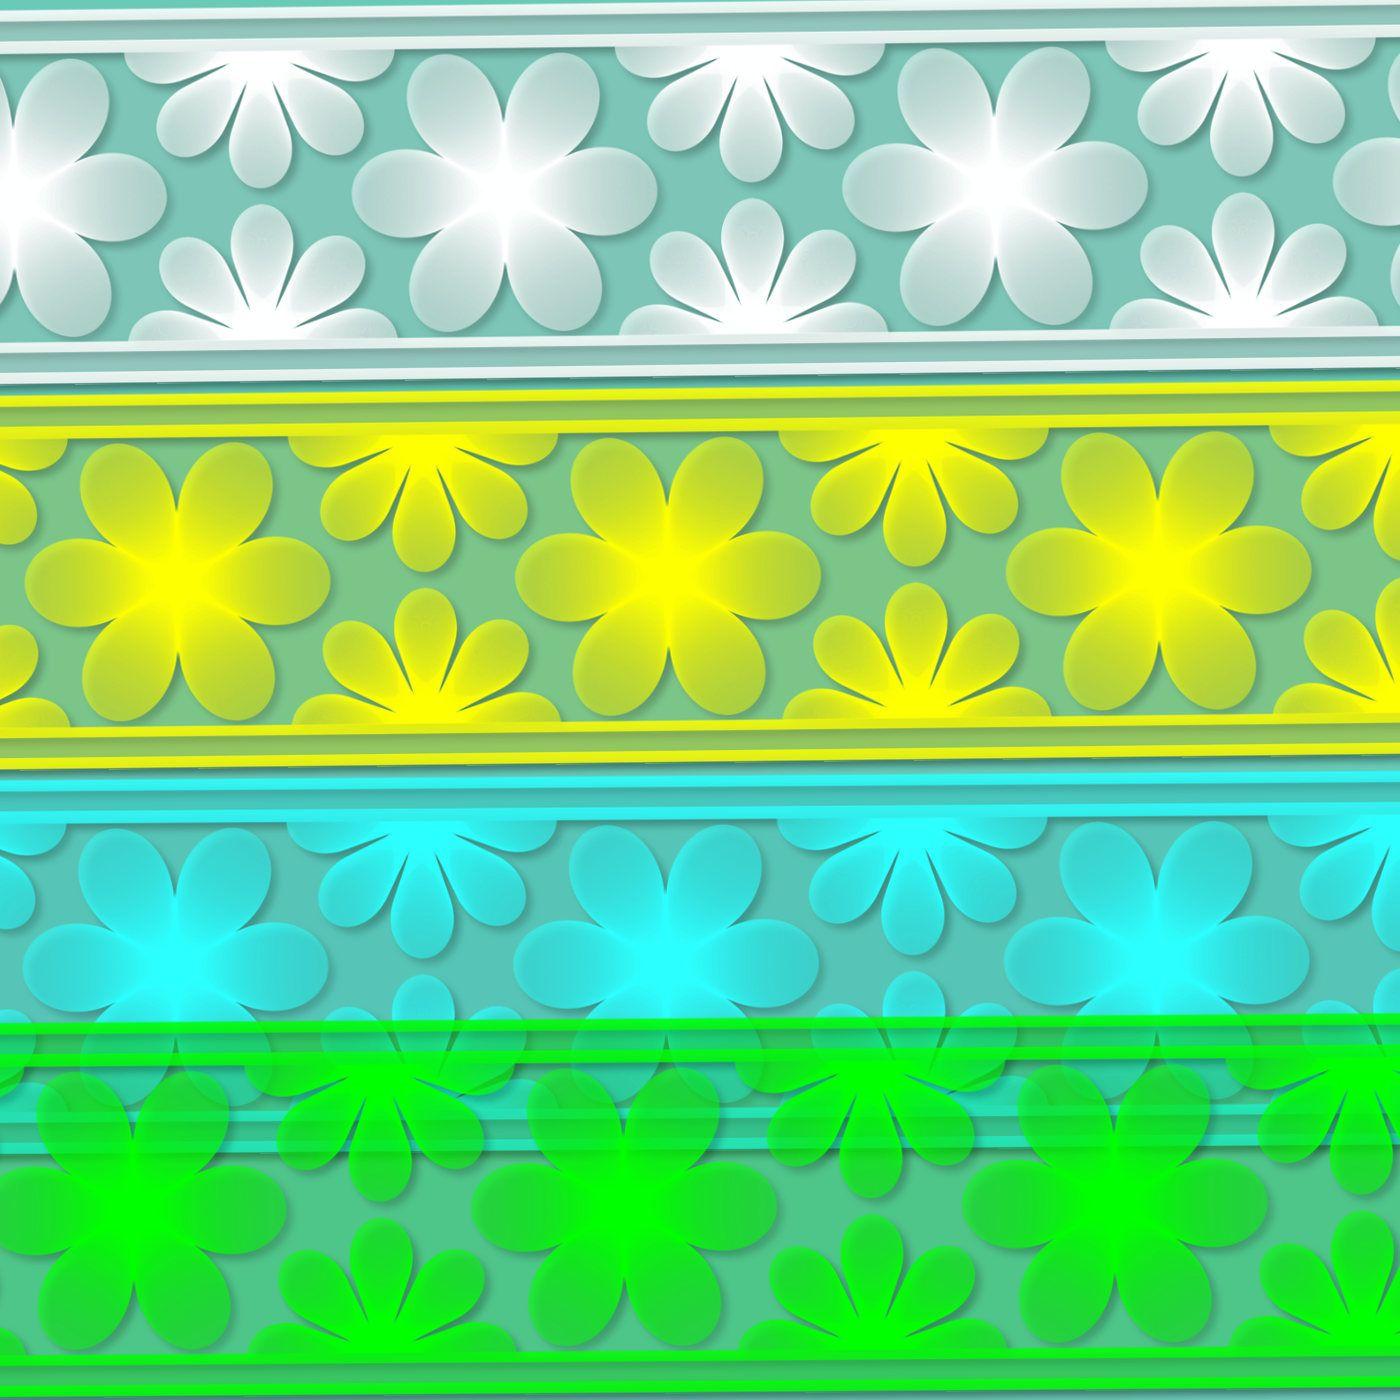 Delicate Lace Transparent Border Ribbon Elegant Png Flowers 3D White Snowflakes Digital Clipart Vector Photo Frame Decoration